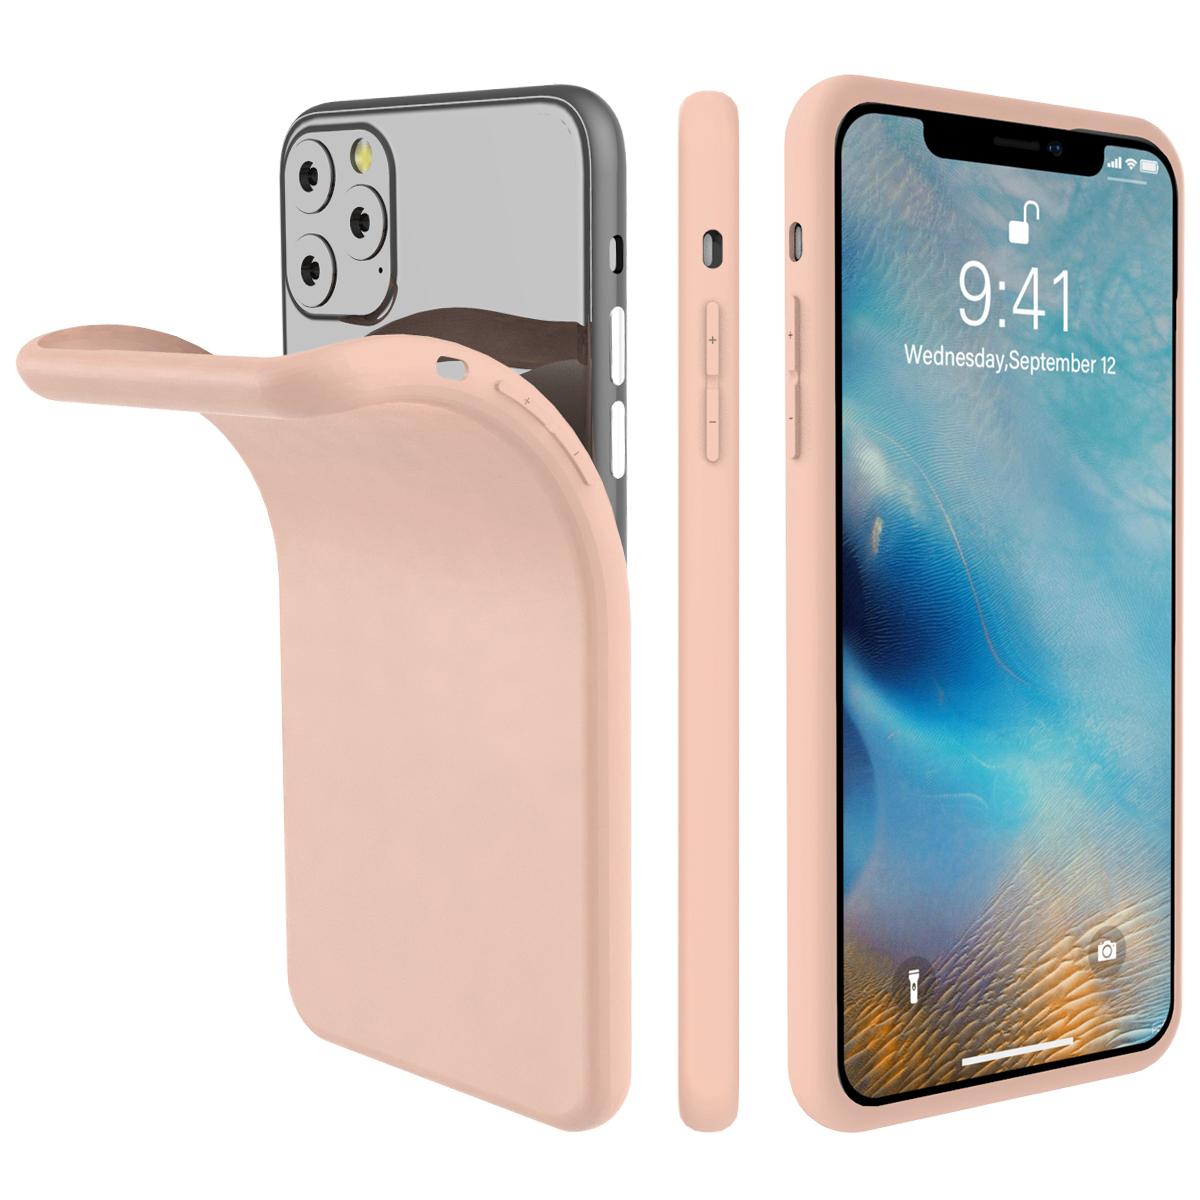 Torubia Silicone Case for iPhone 11/11 Pro/11 Pro Max 107